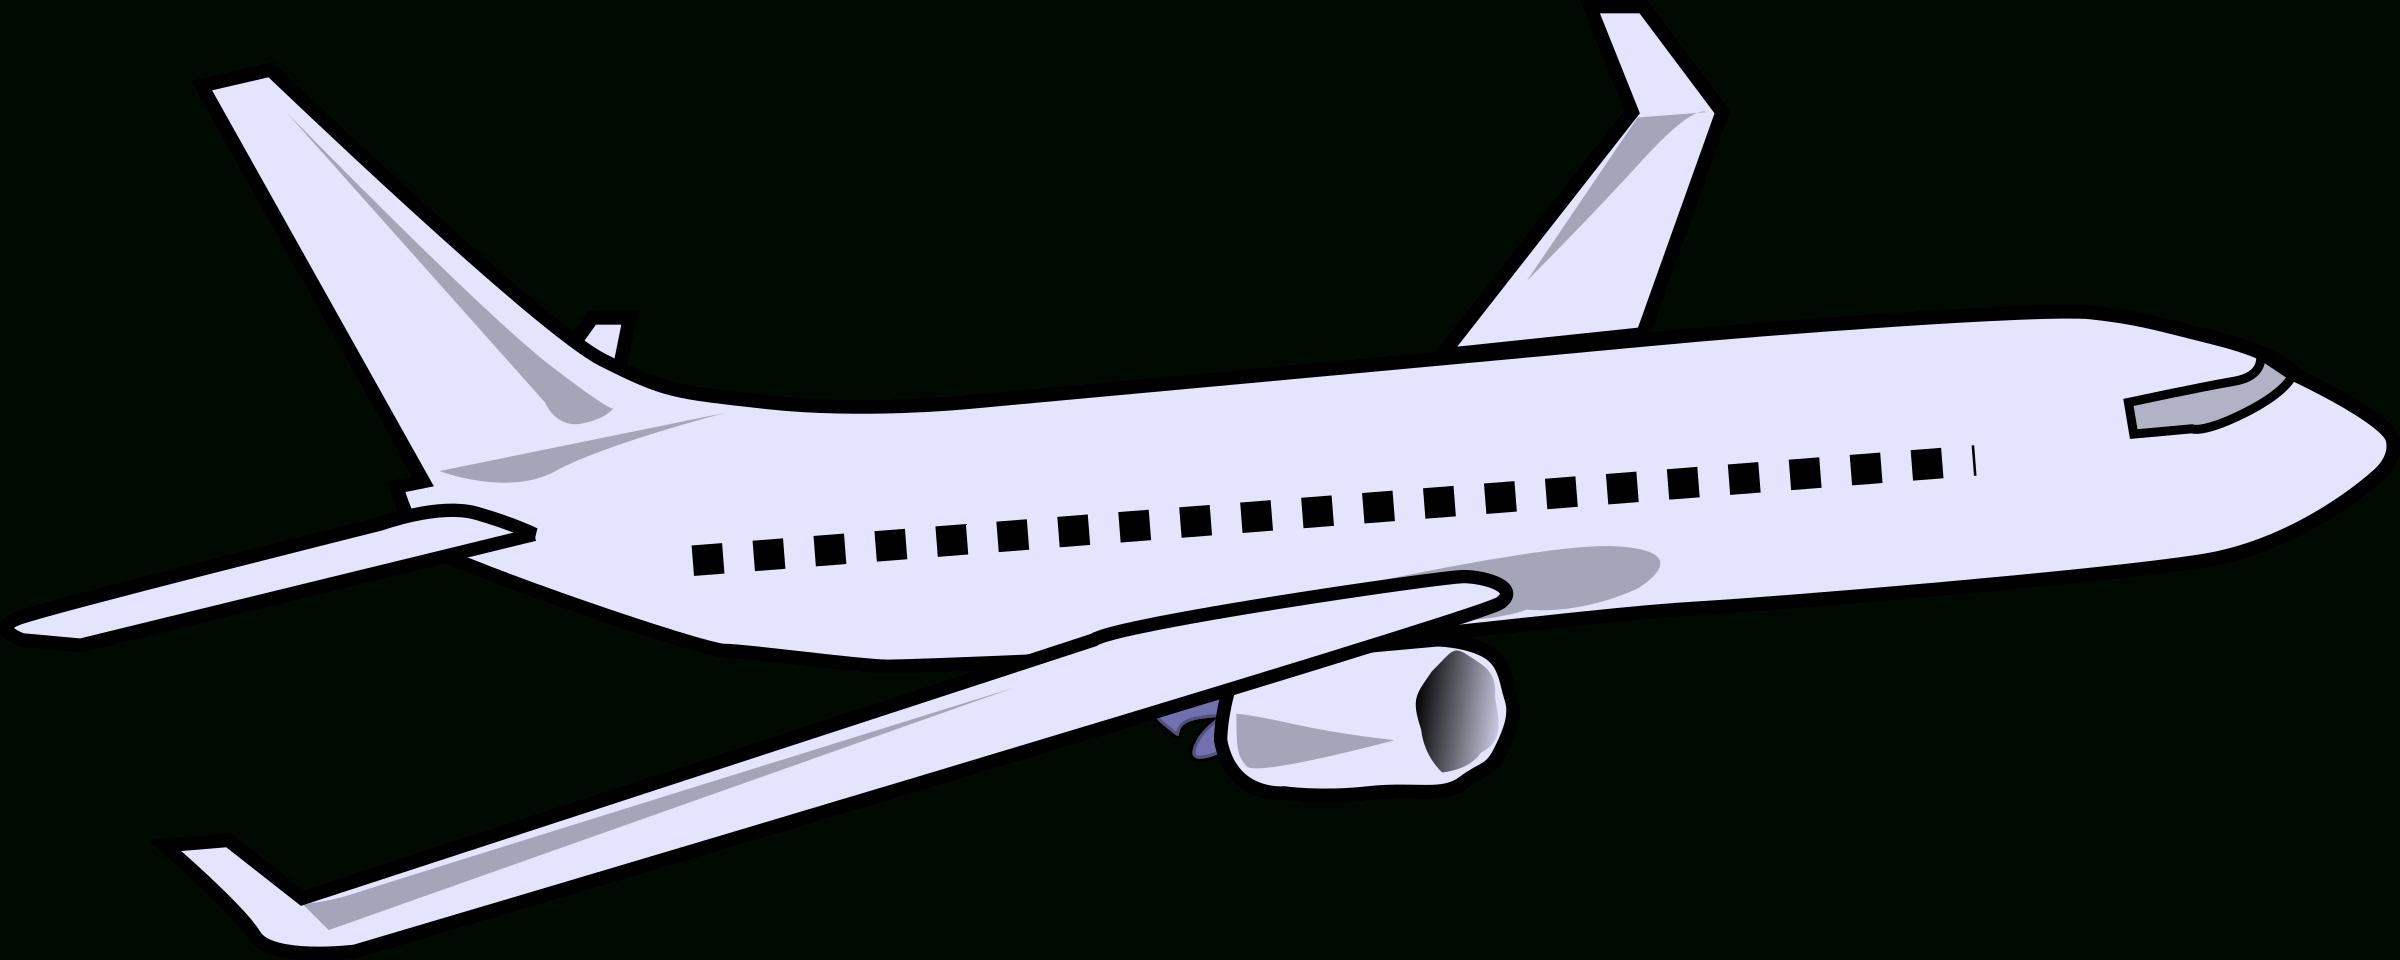 Pin Oleh Enosart Com Di Transportation Clipart Pesawat Kartun Gambar Kartun